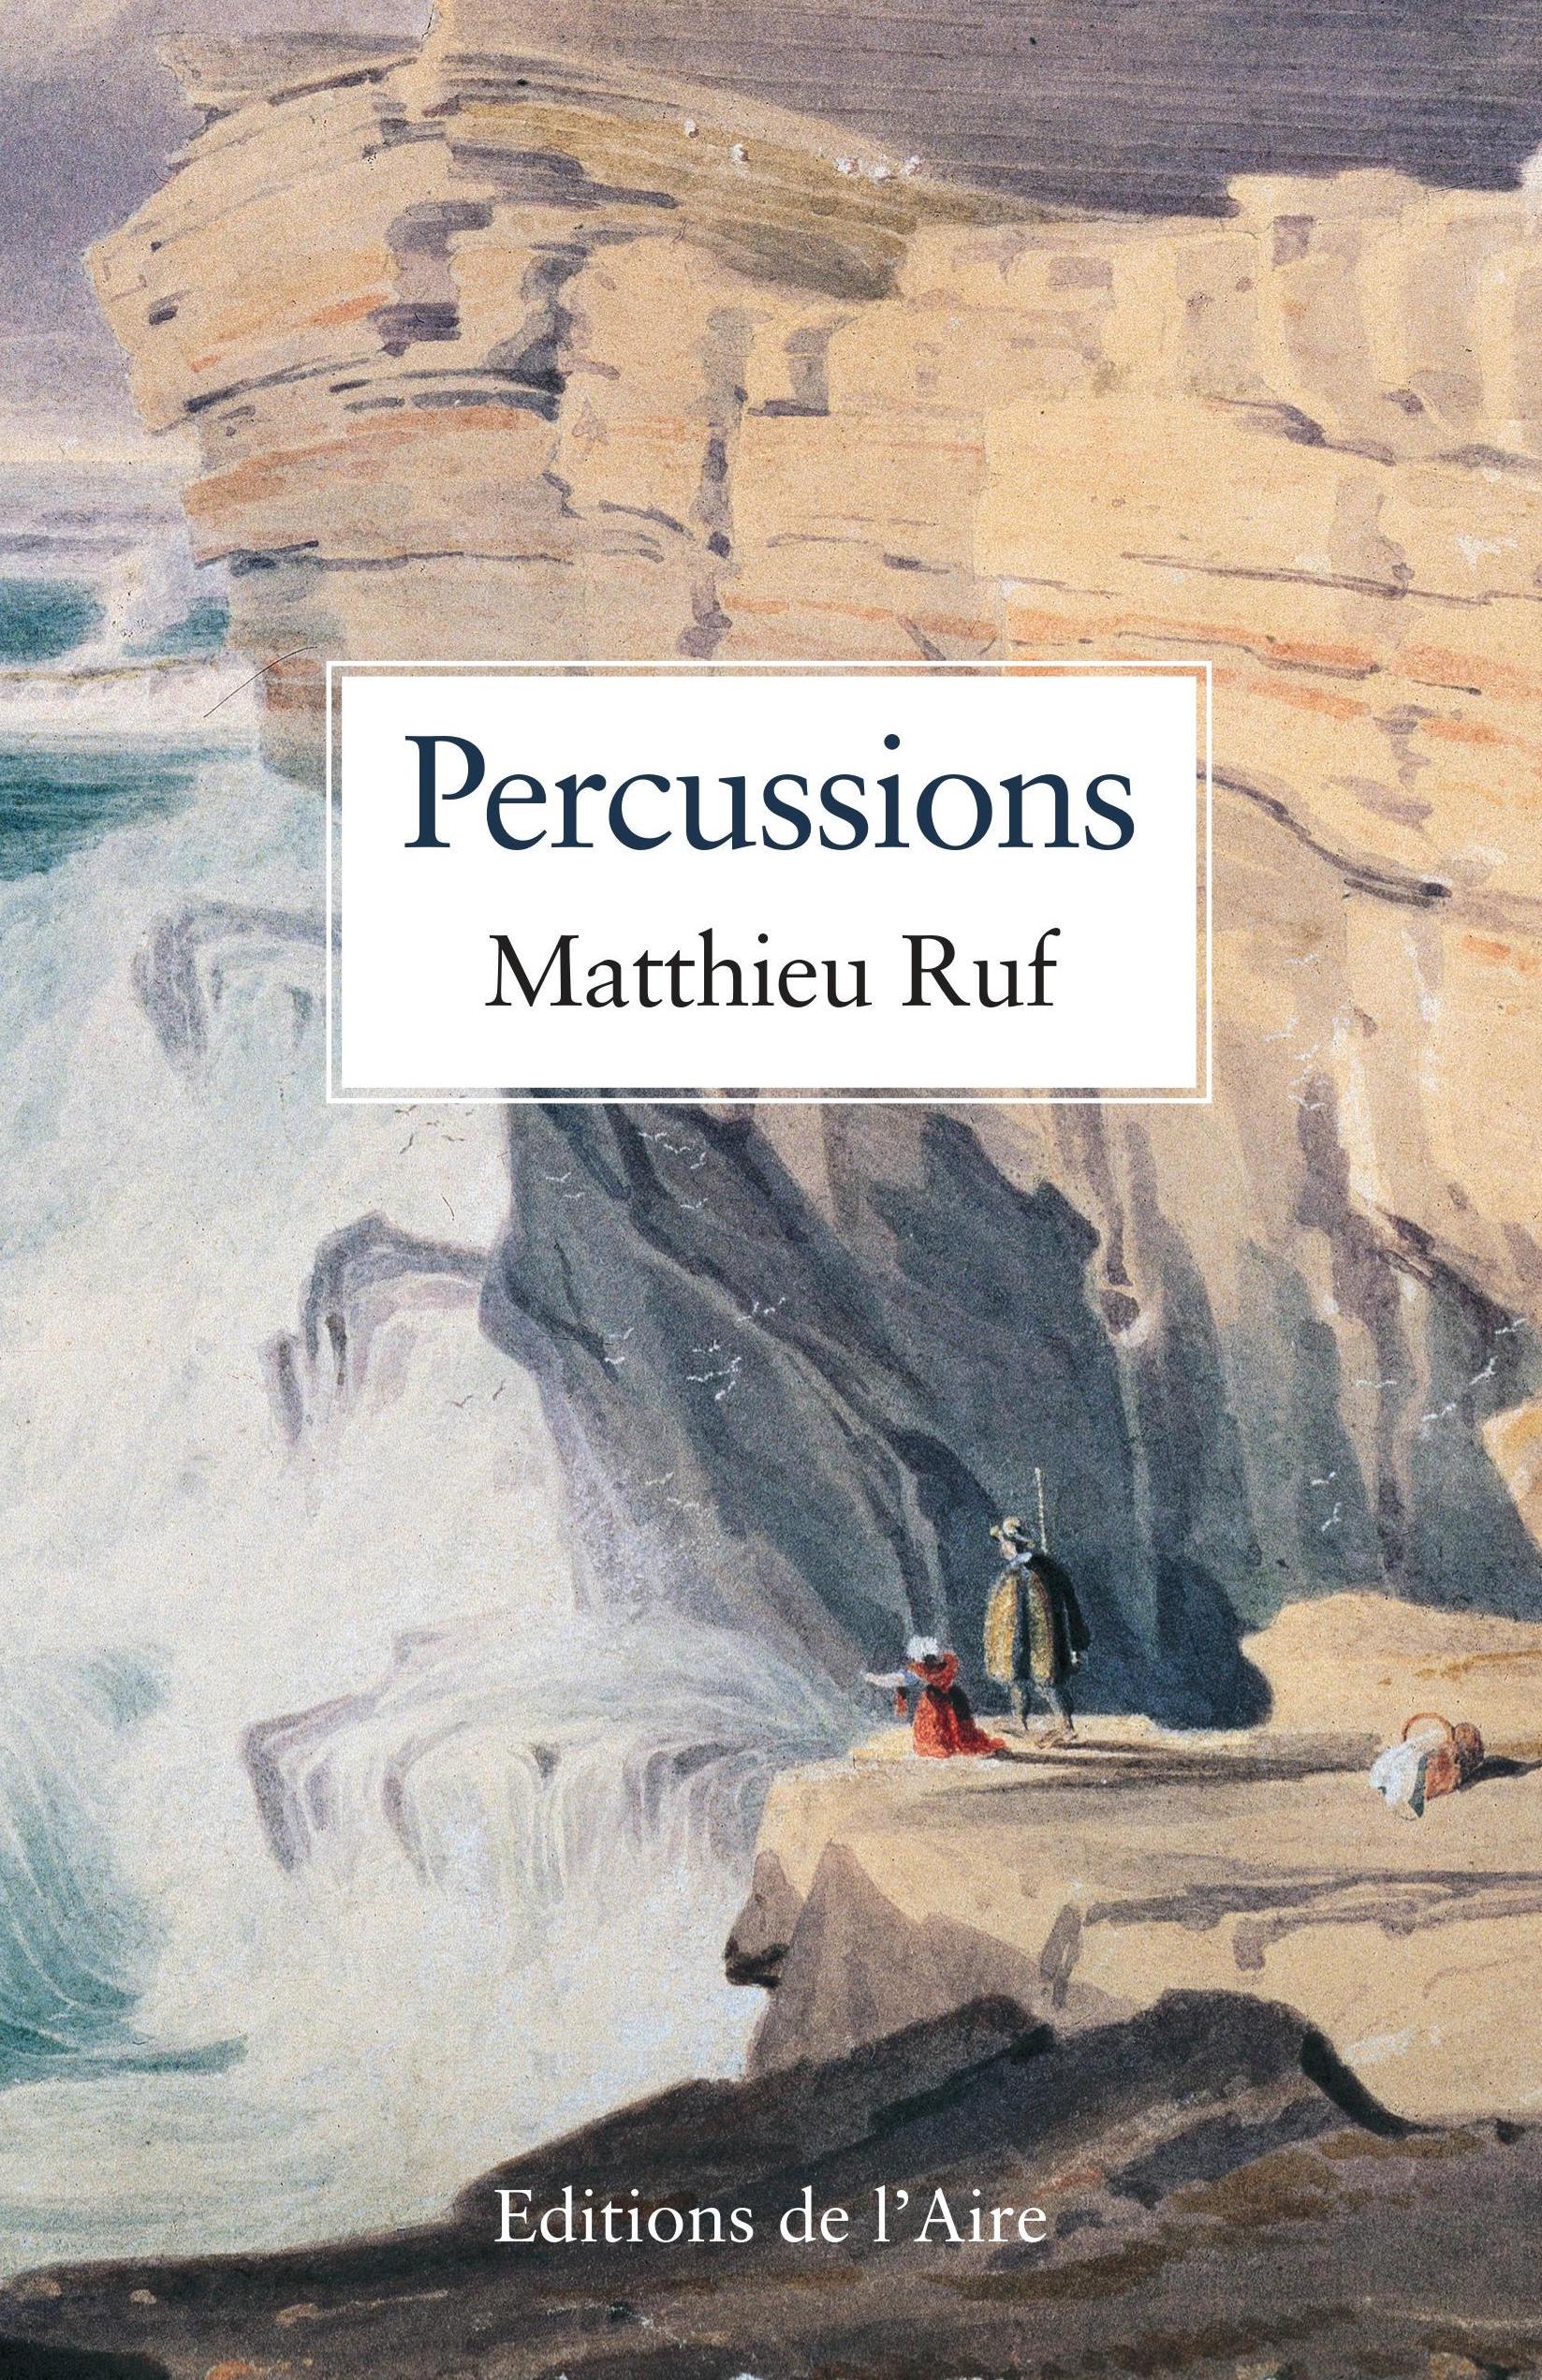 Percussions, Ruf, Matthieu